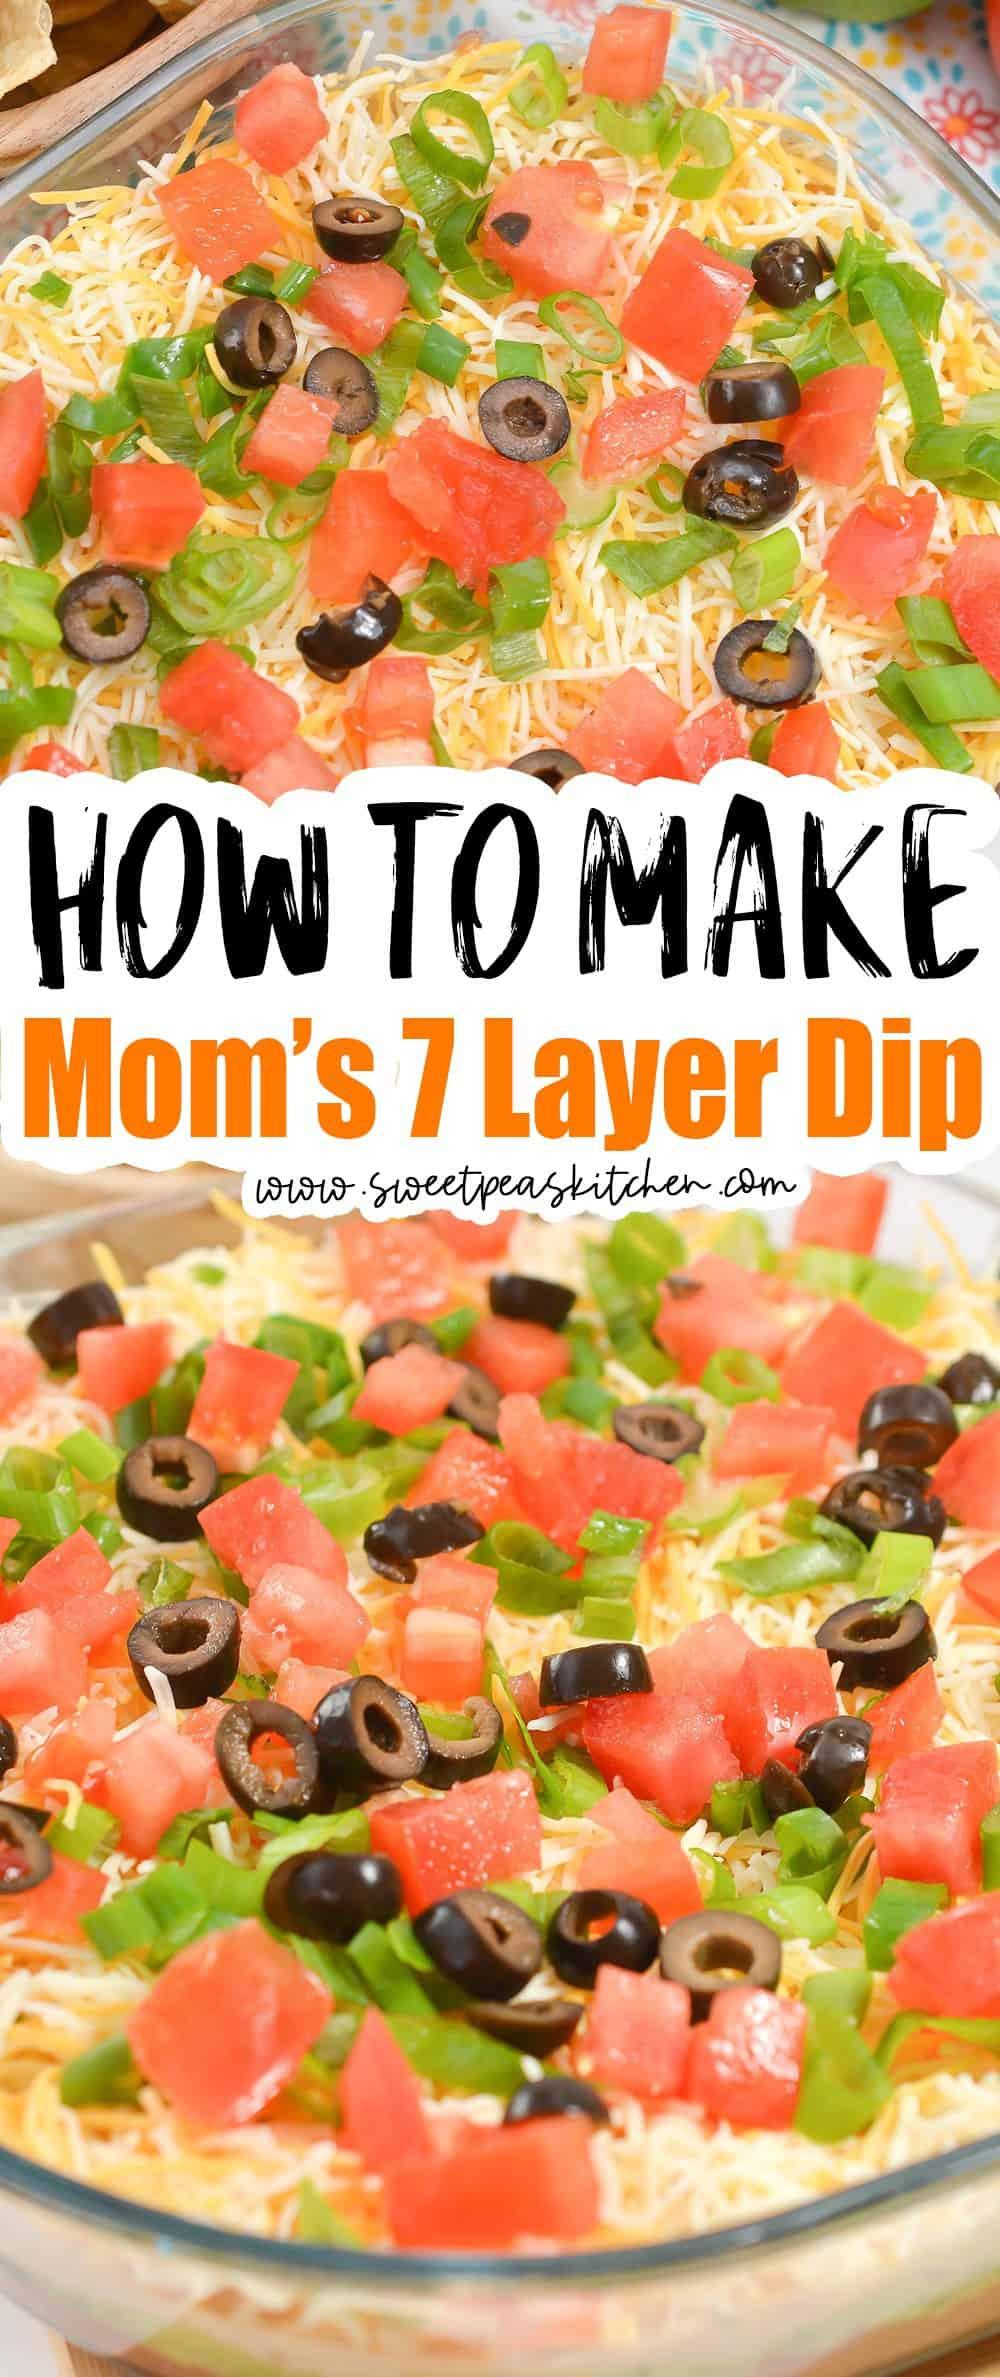 Mom's 7 Layer Dip